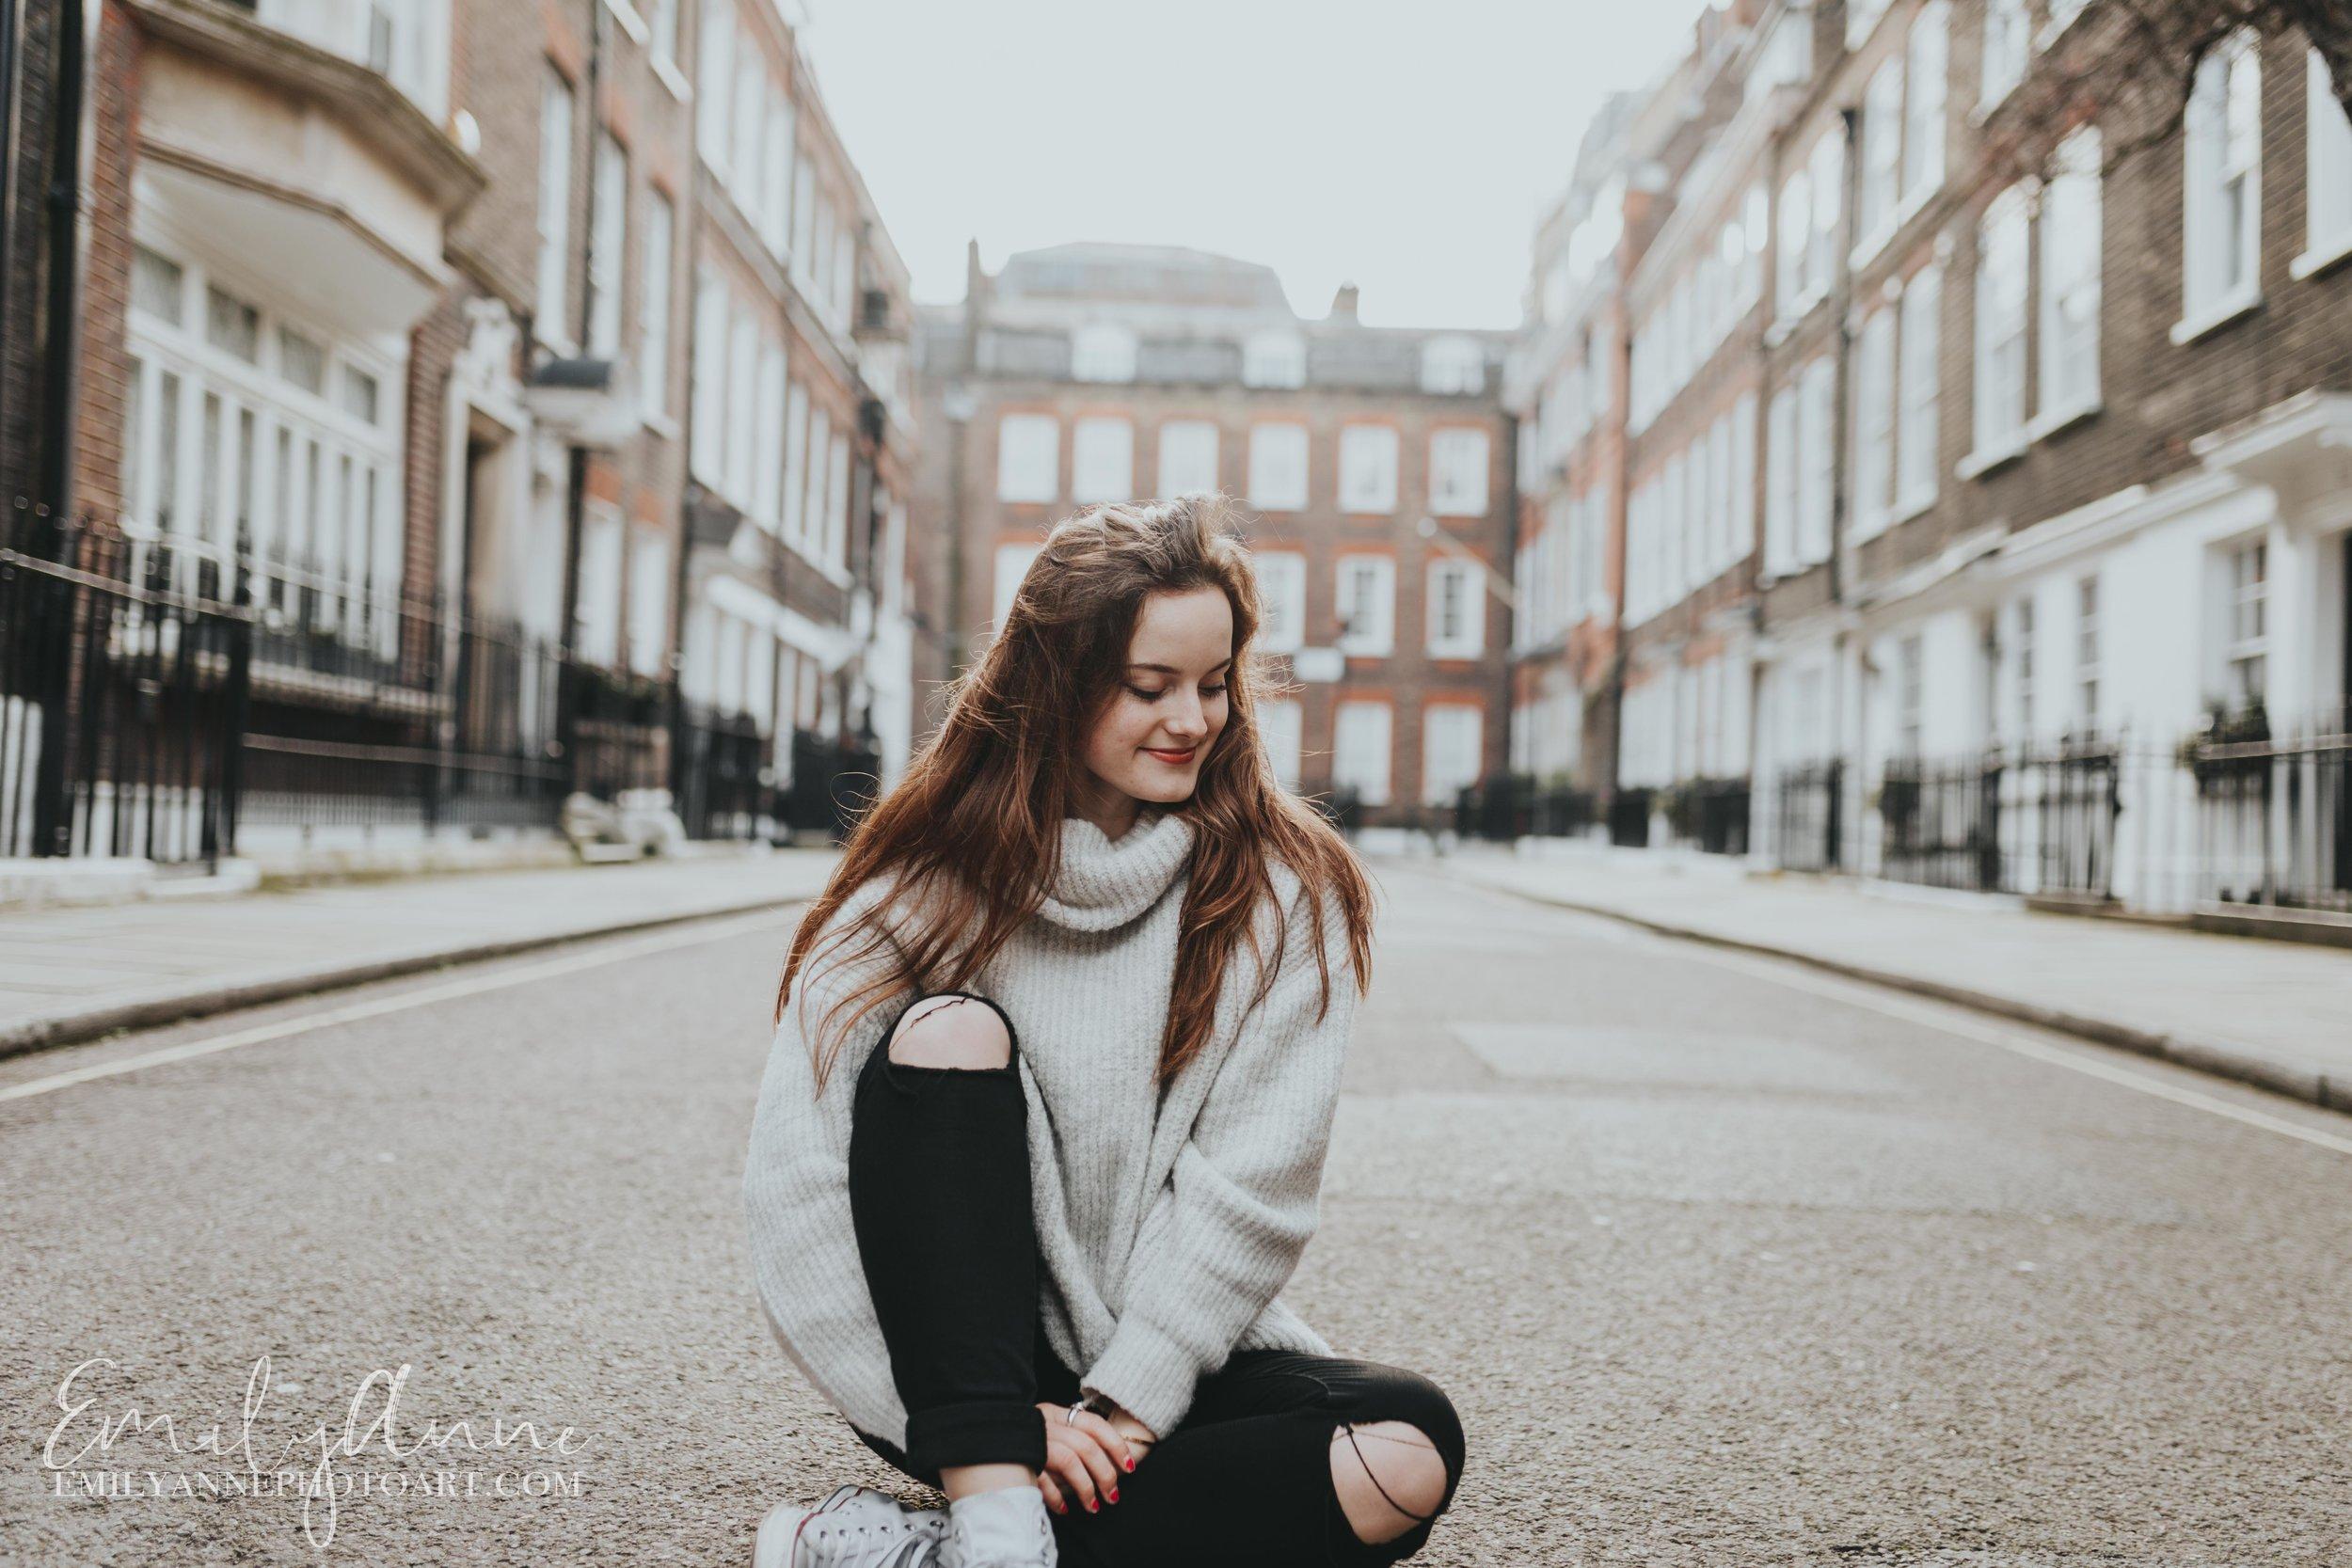 fun senior/model portraits in London UK by Nashville Photogrpaher Emily Anne